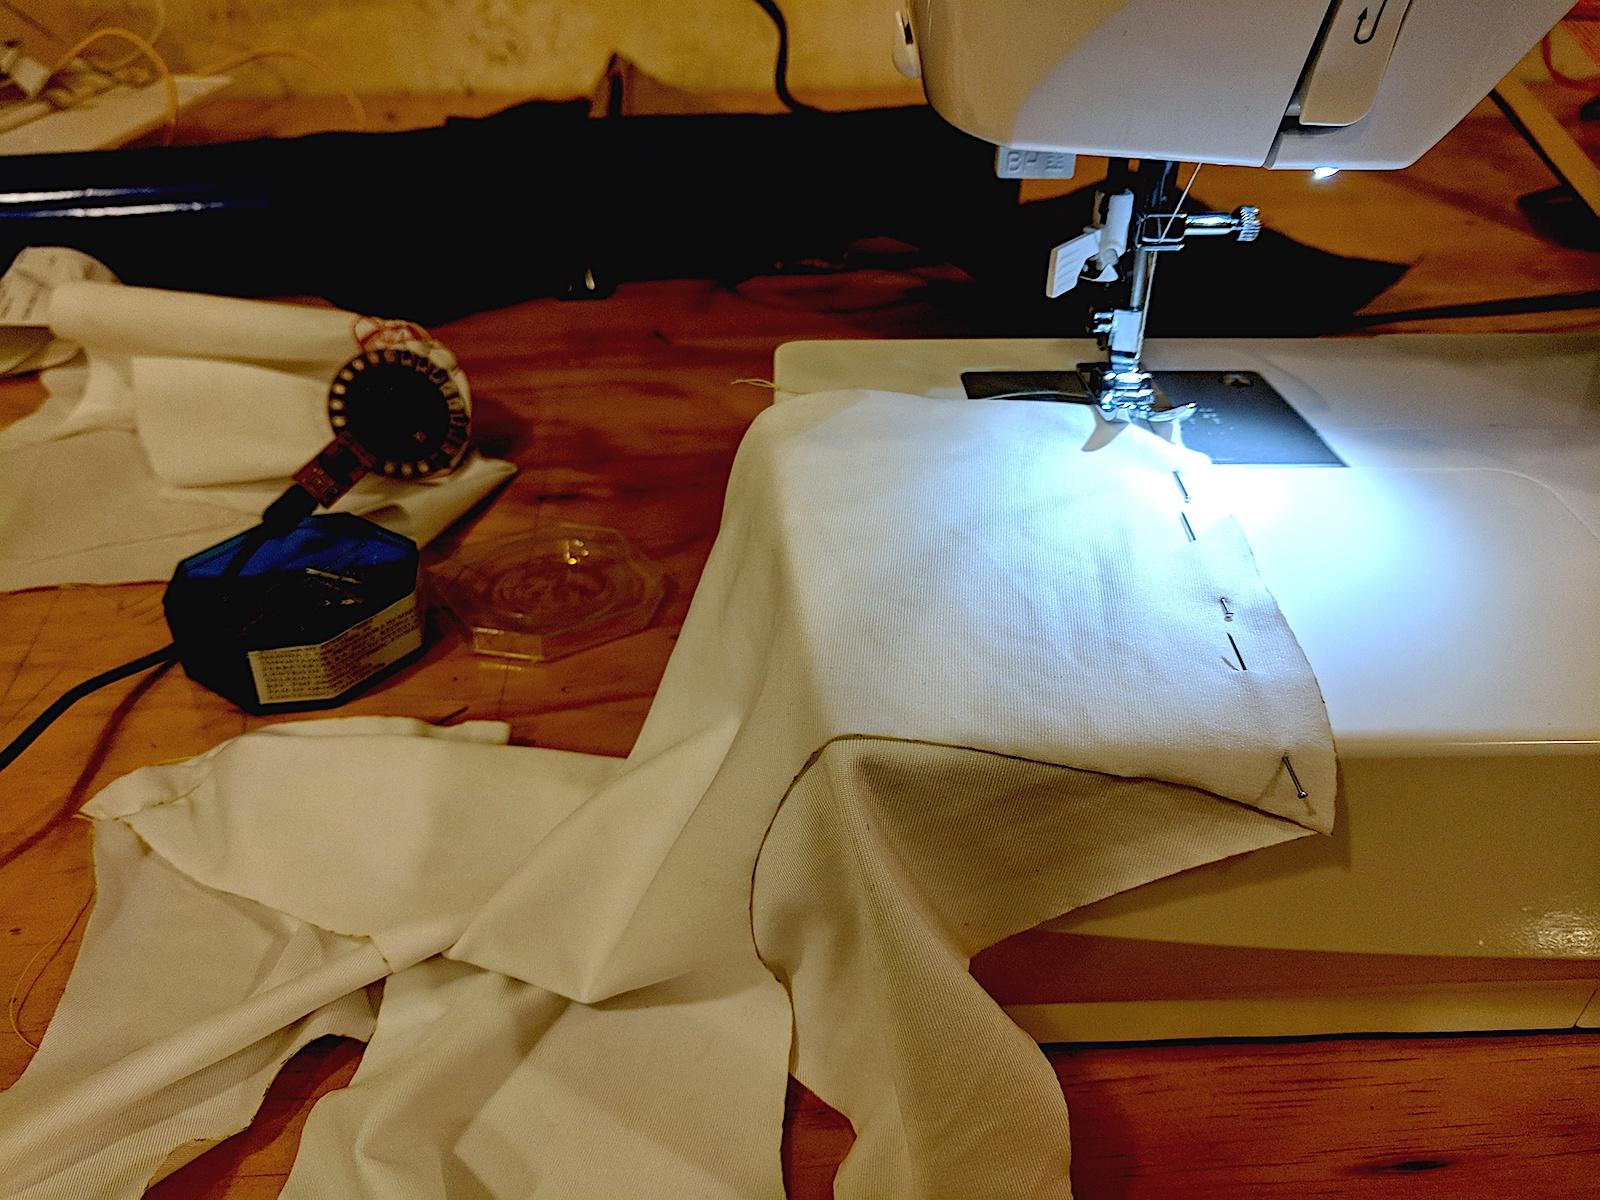 W9_Sewing the bra.jpg